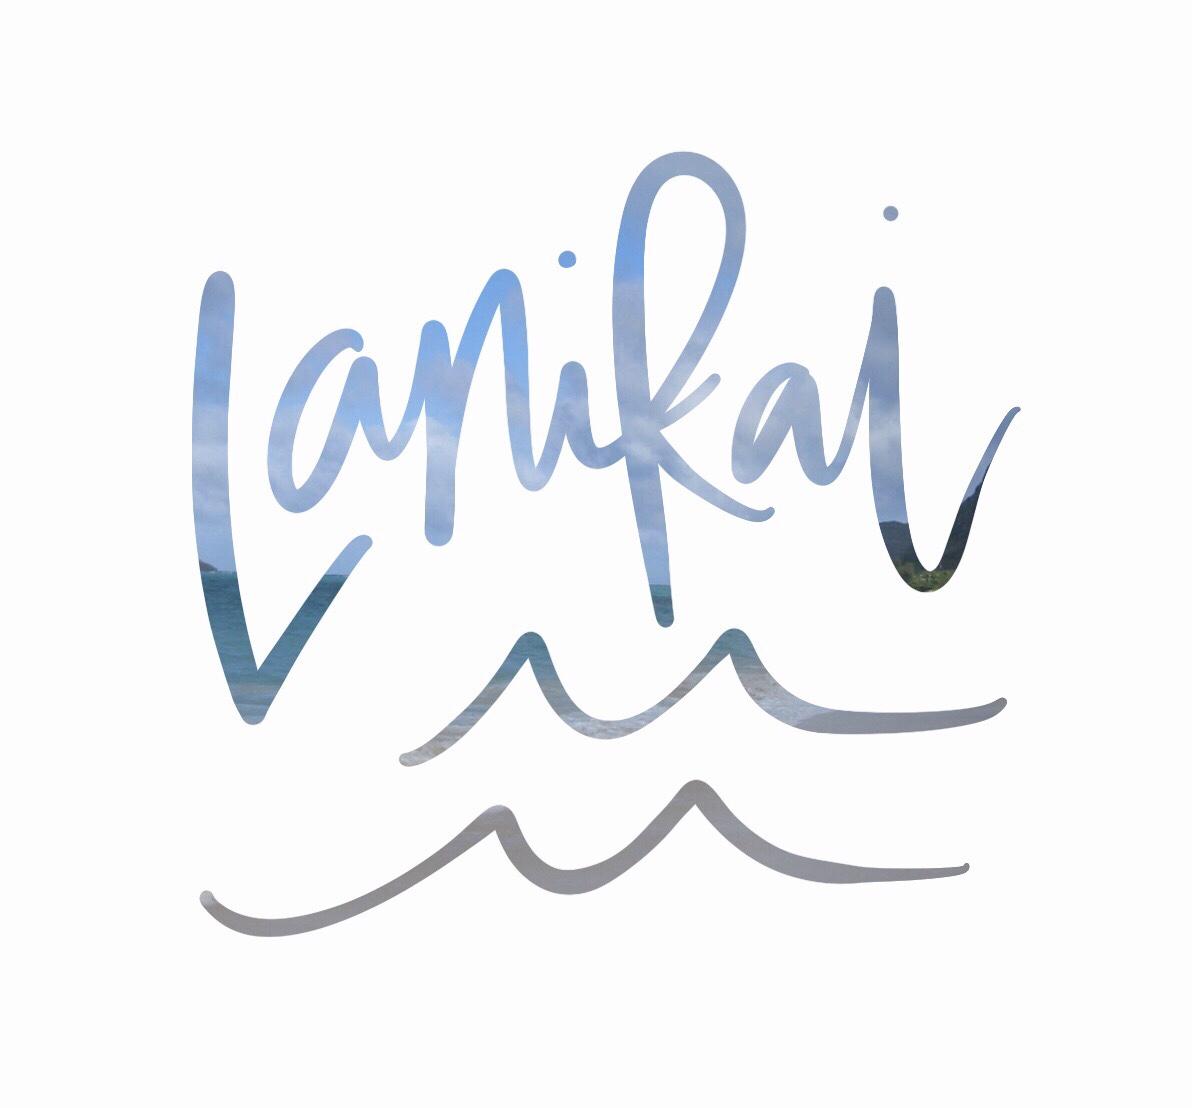 Lanikai is actually a town adjoining Kailua, on SE Oahu.